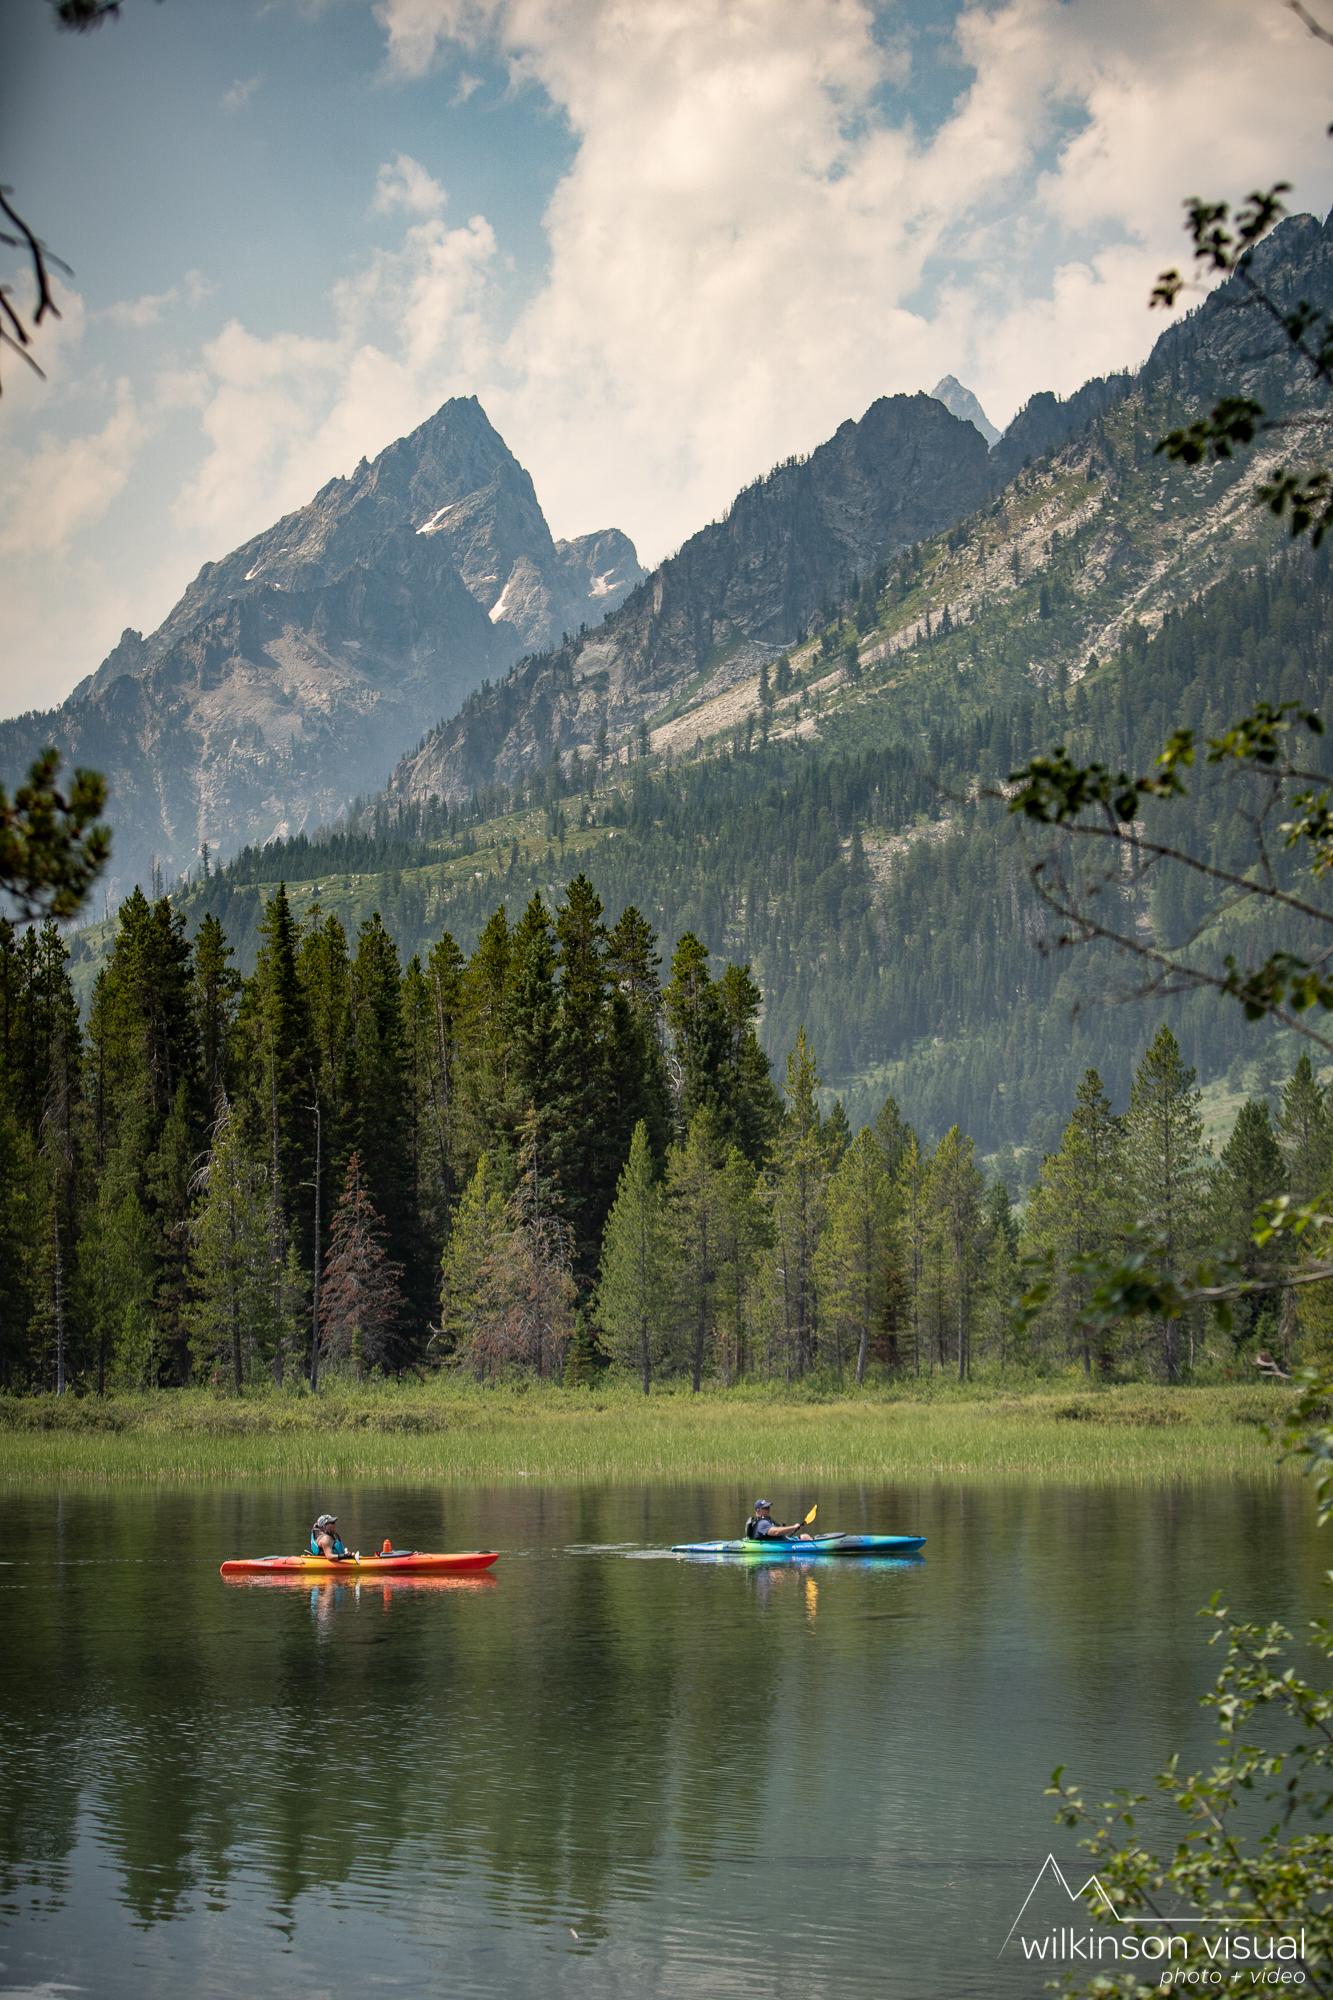 Kayakers paddle along String Lake in Grand Teton National Park.